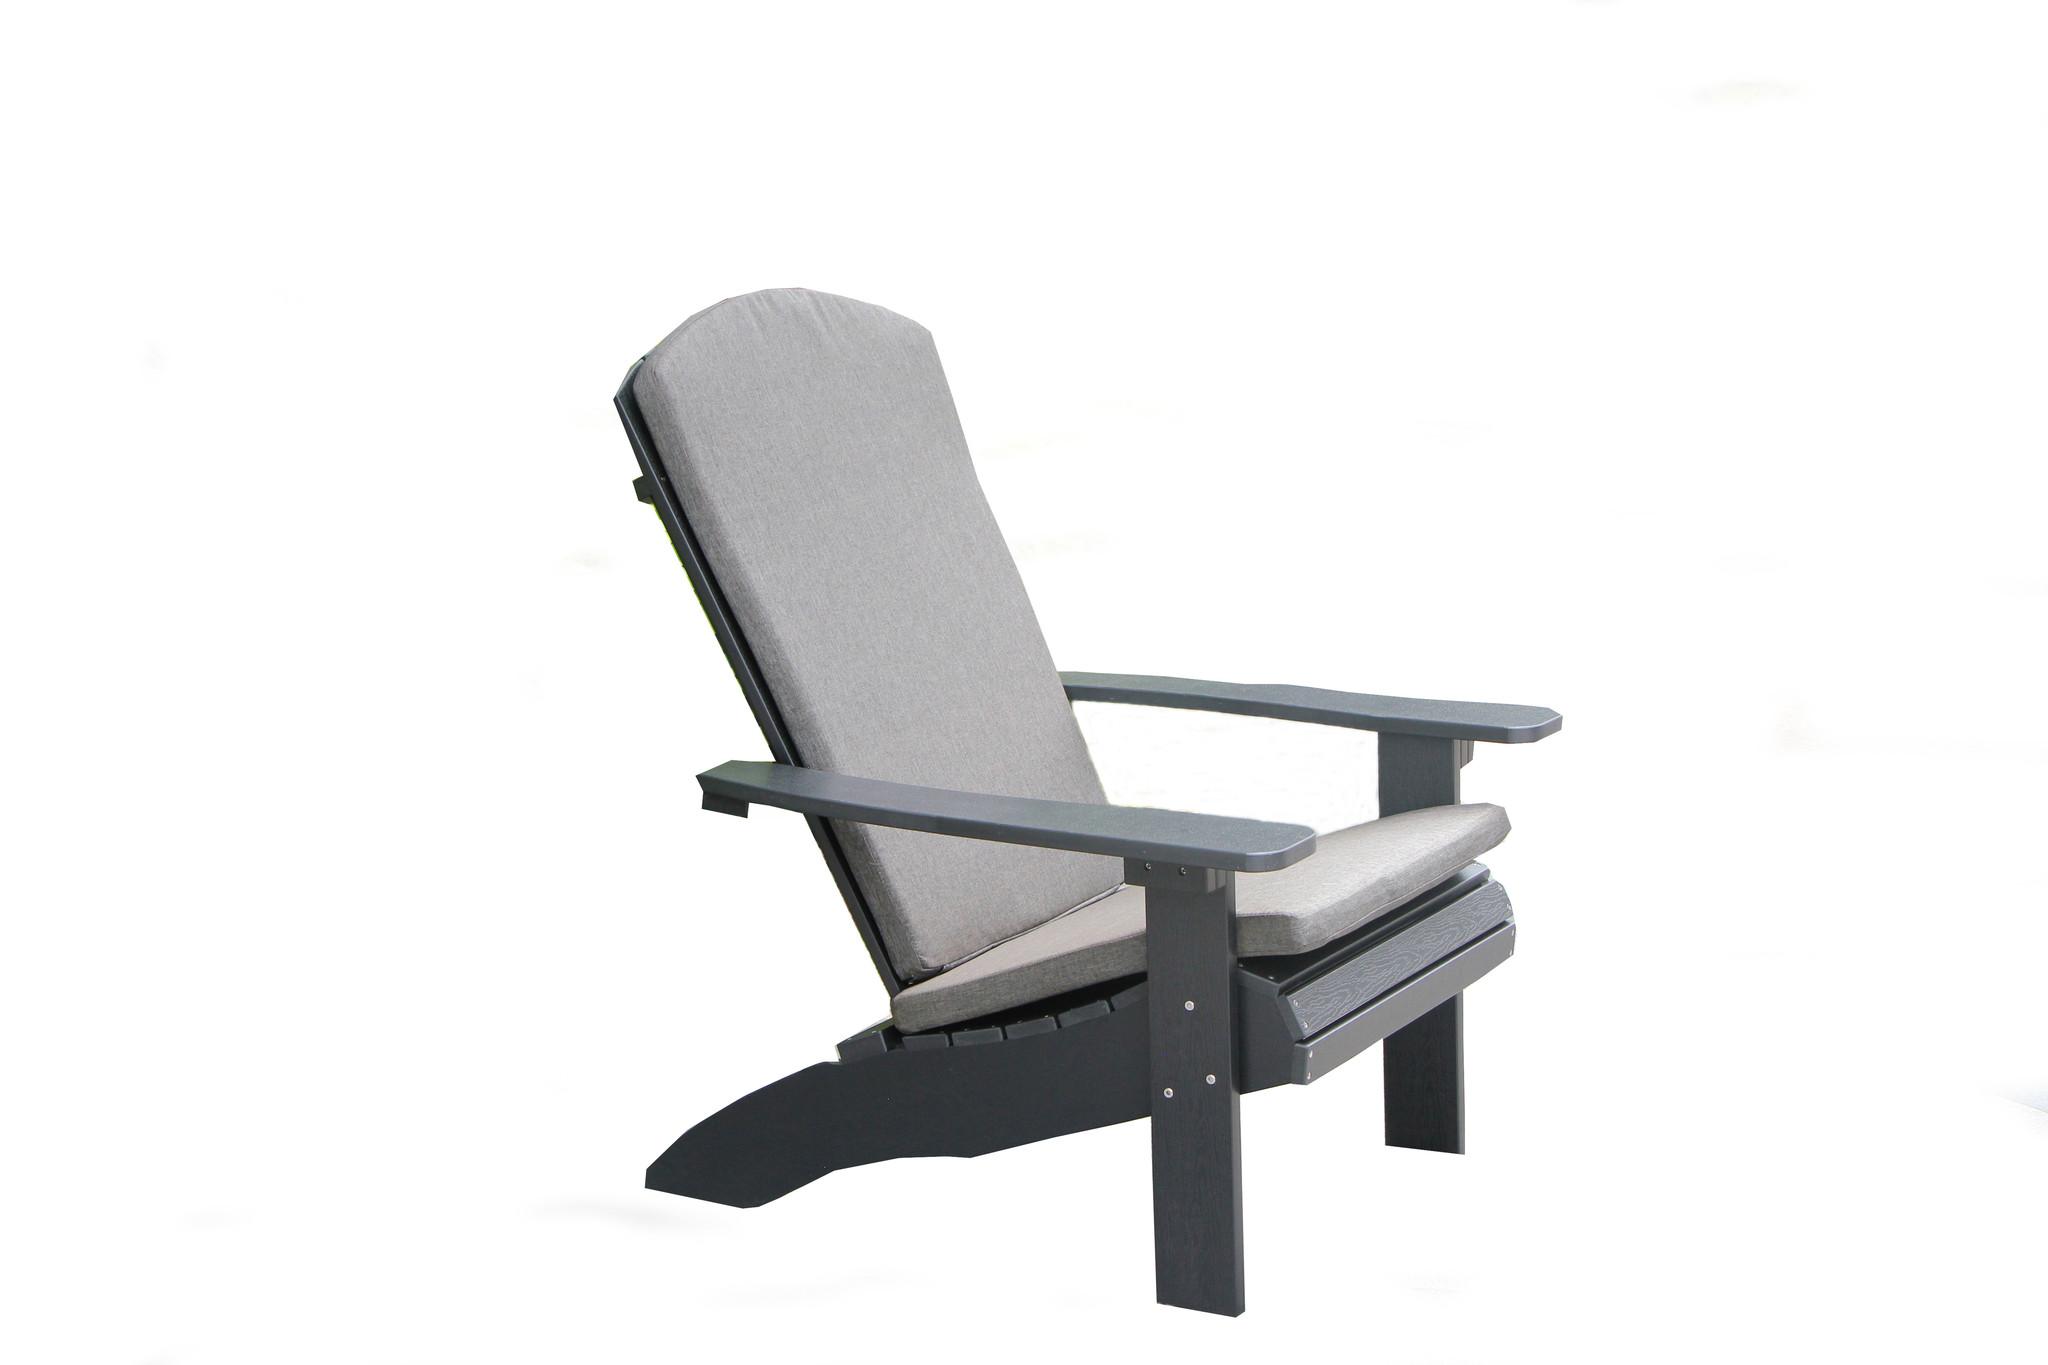 Adirondack Chair Kussens.Garden Interiors Adirondack Set Zwart Kunststof Polywood Garden Interiors